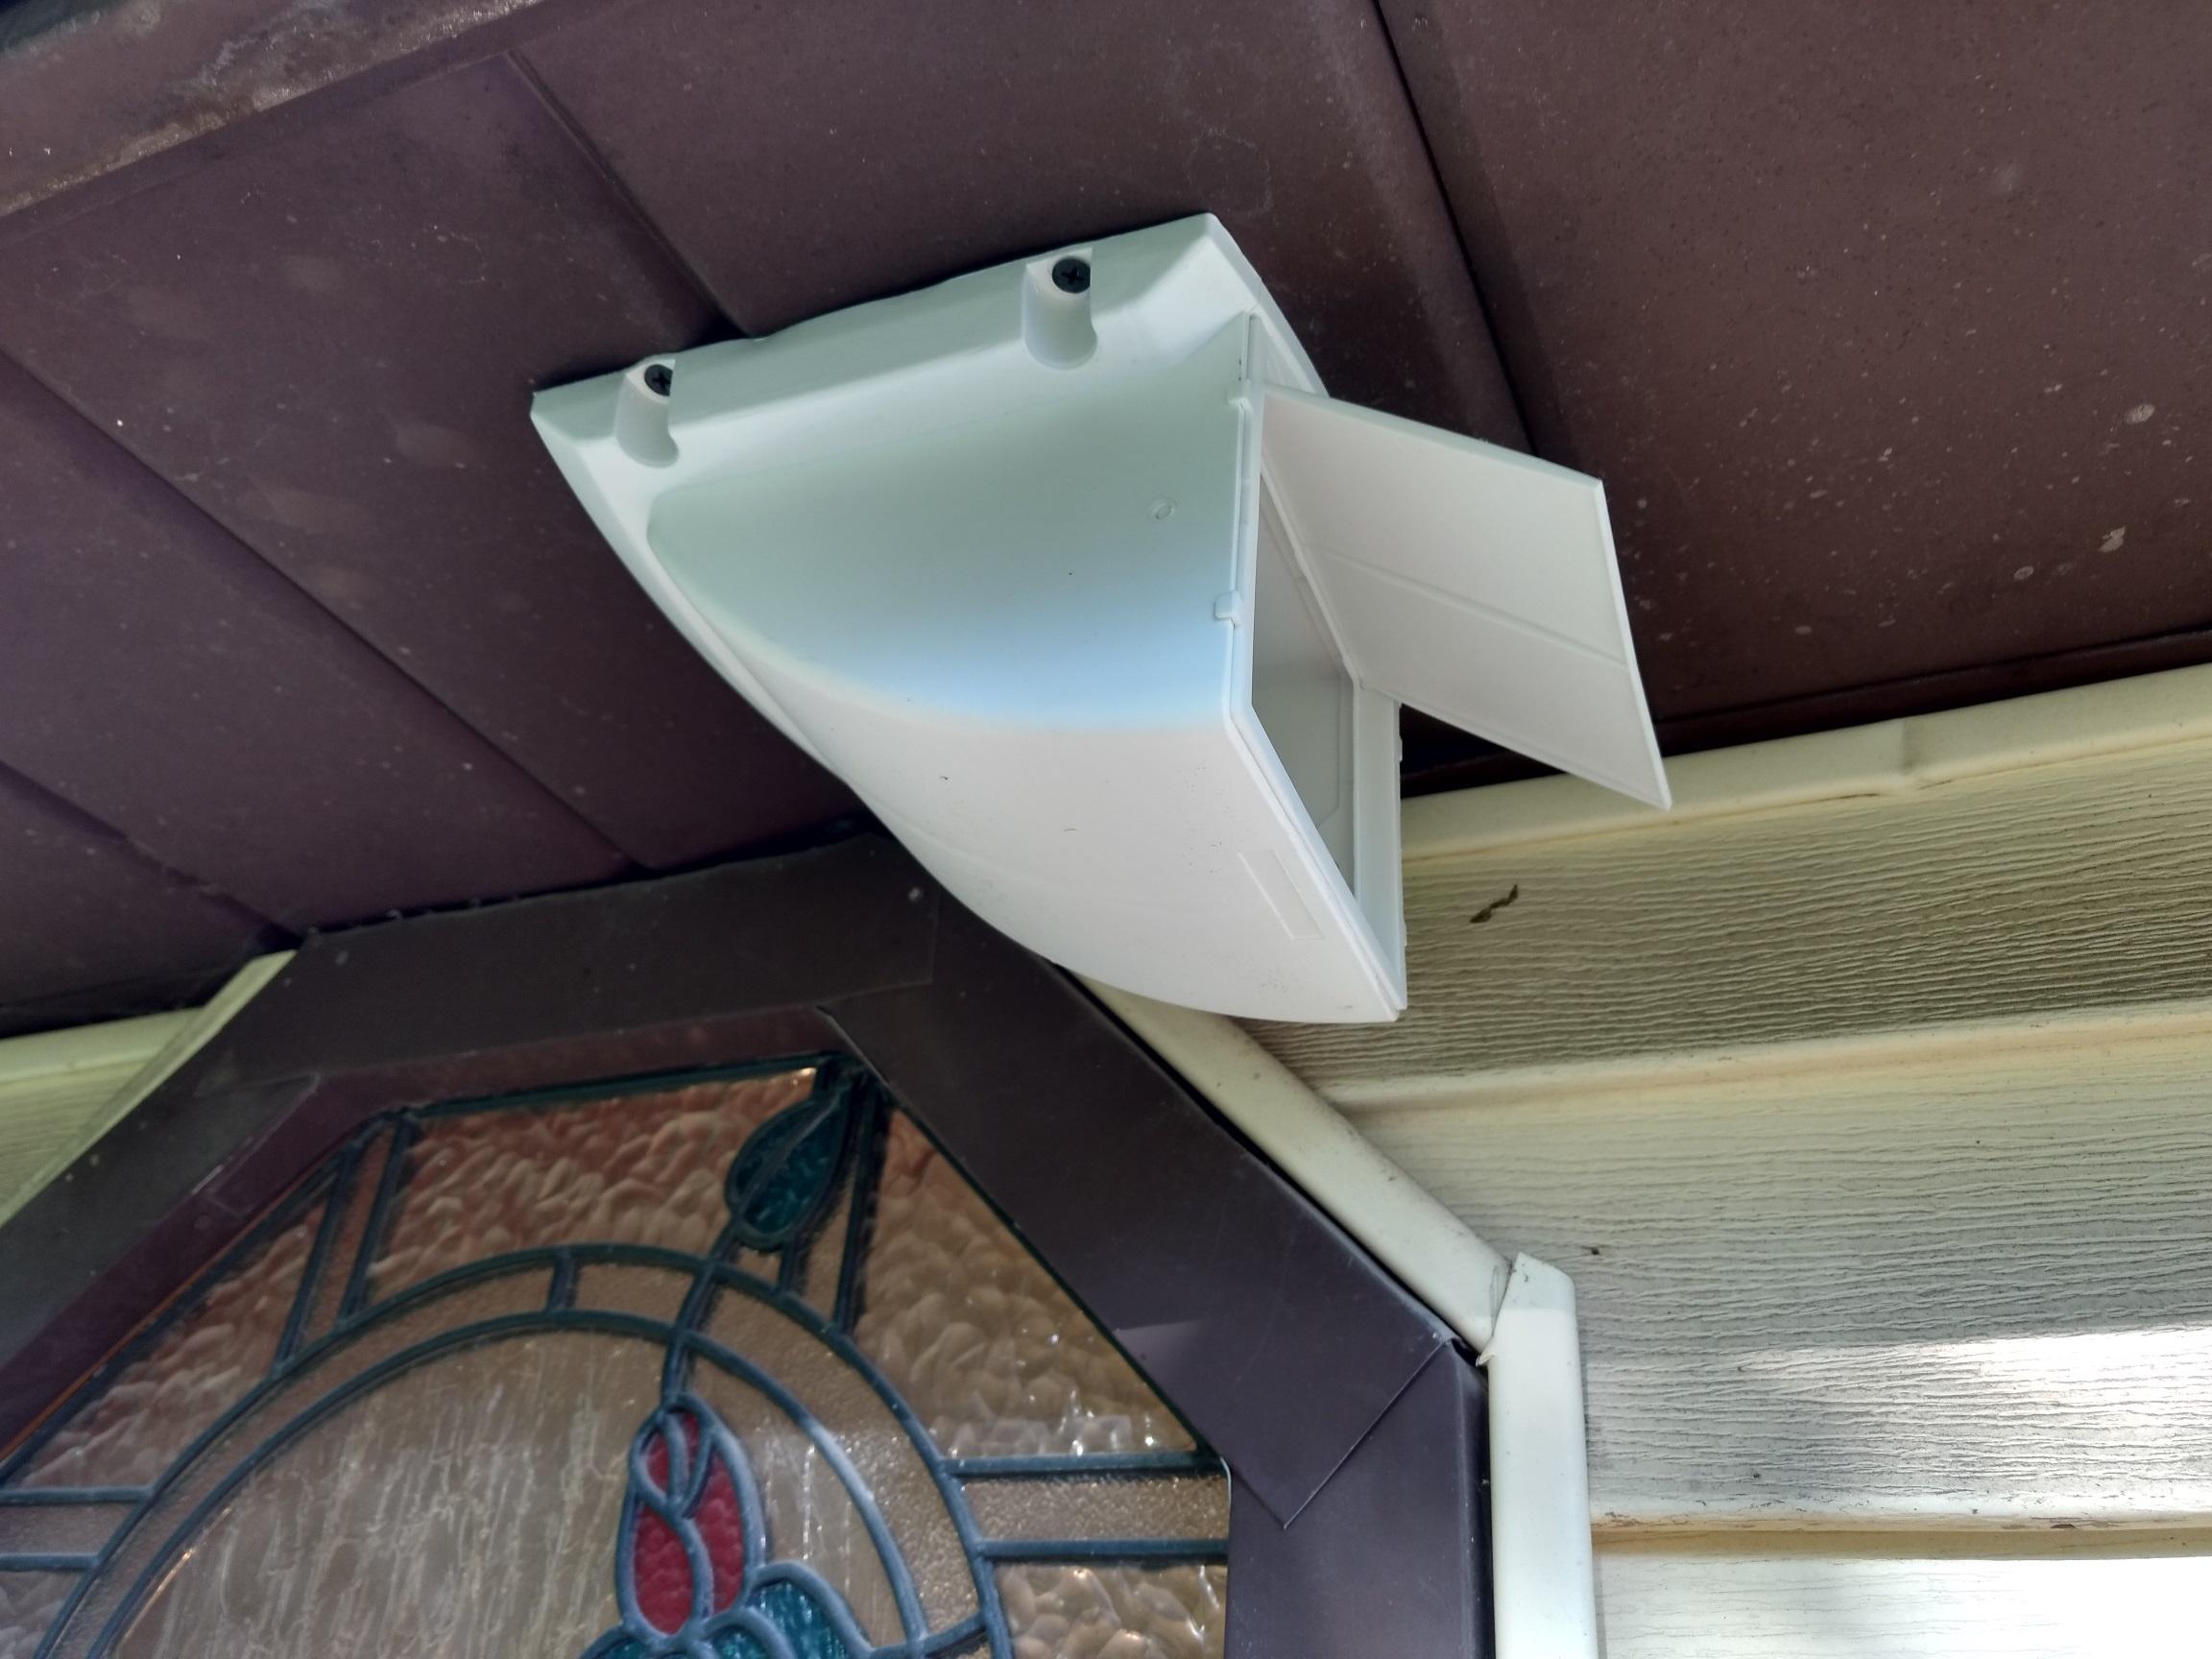 soffit vent for a bathroom fan